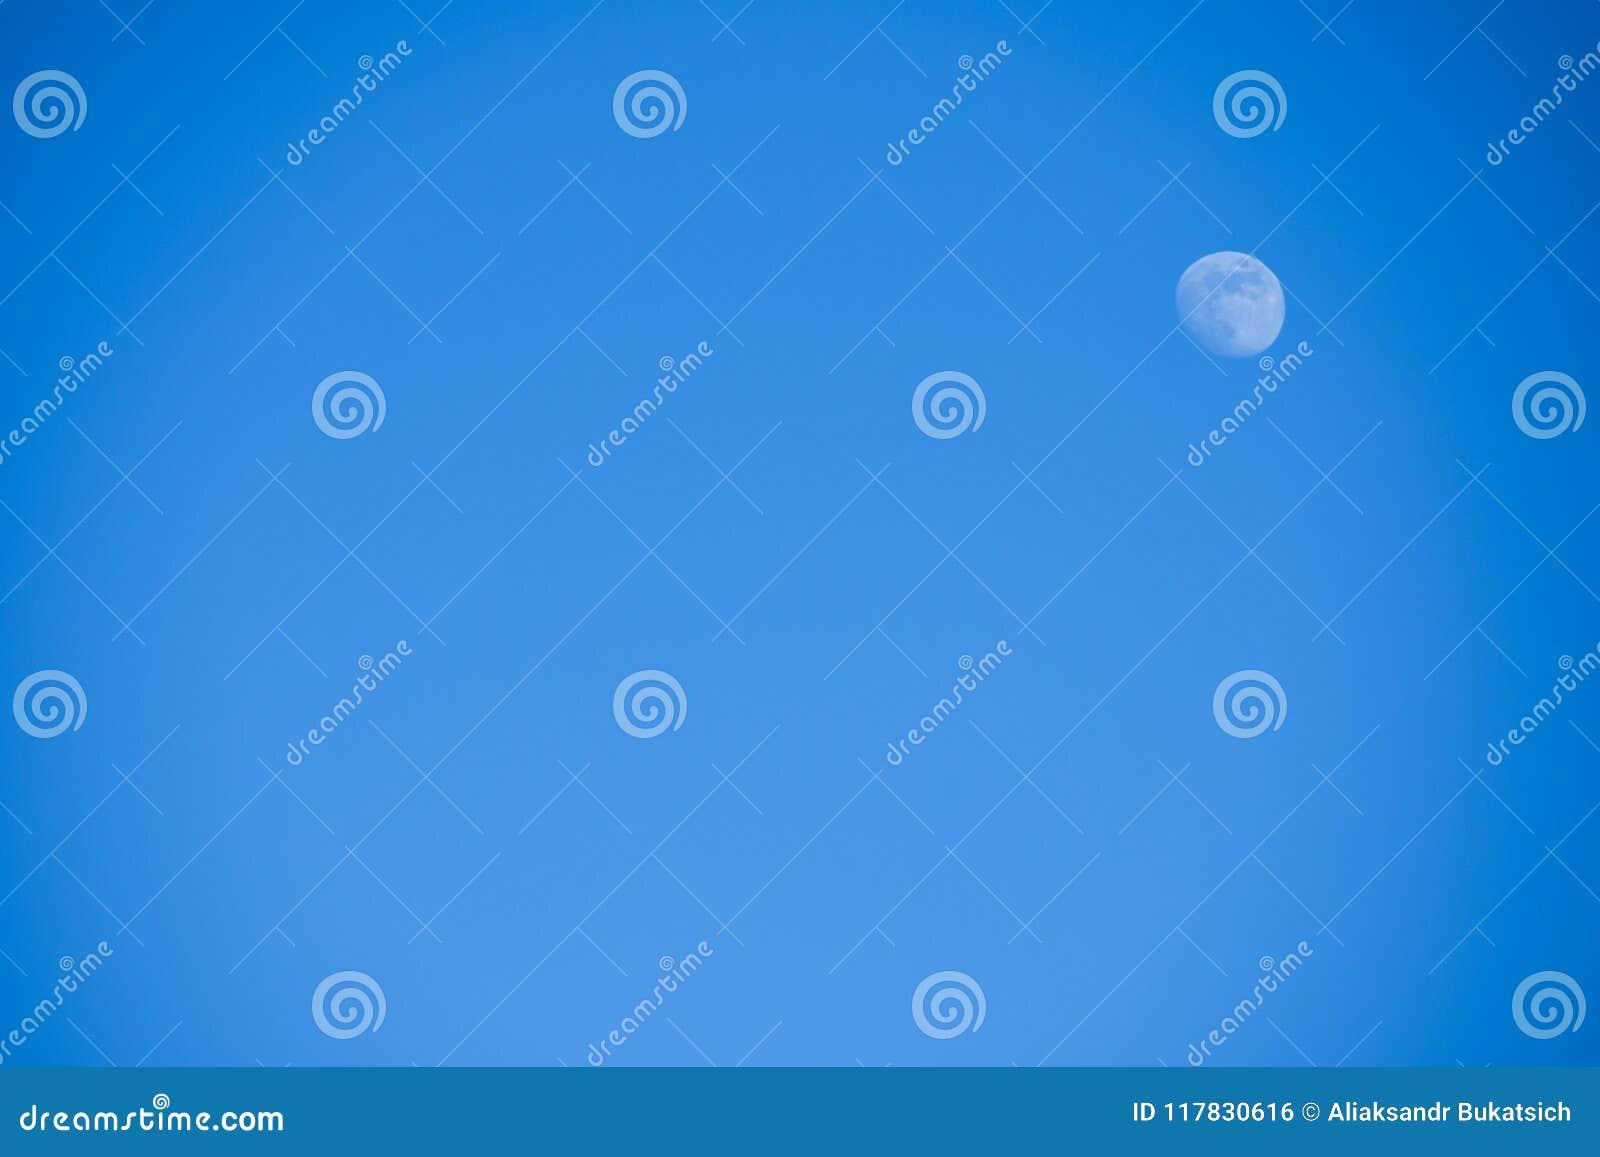 Ljus liten full blå måne mot en blå himmel i eftermiddagen, bakgrund, copyspace